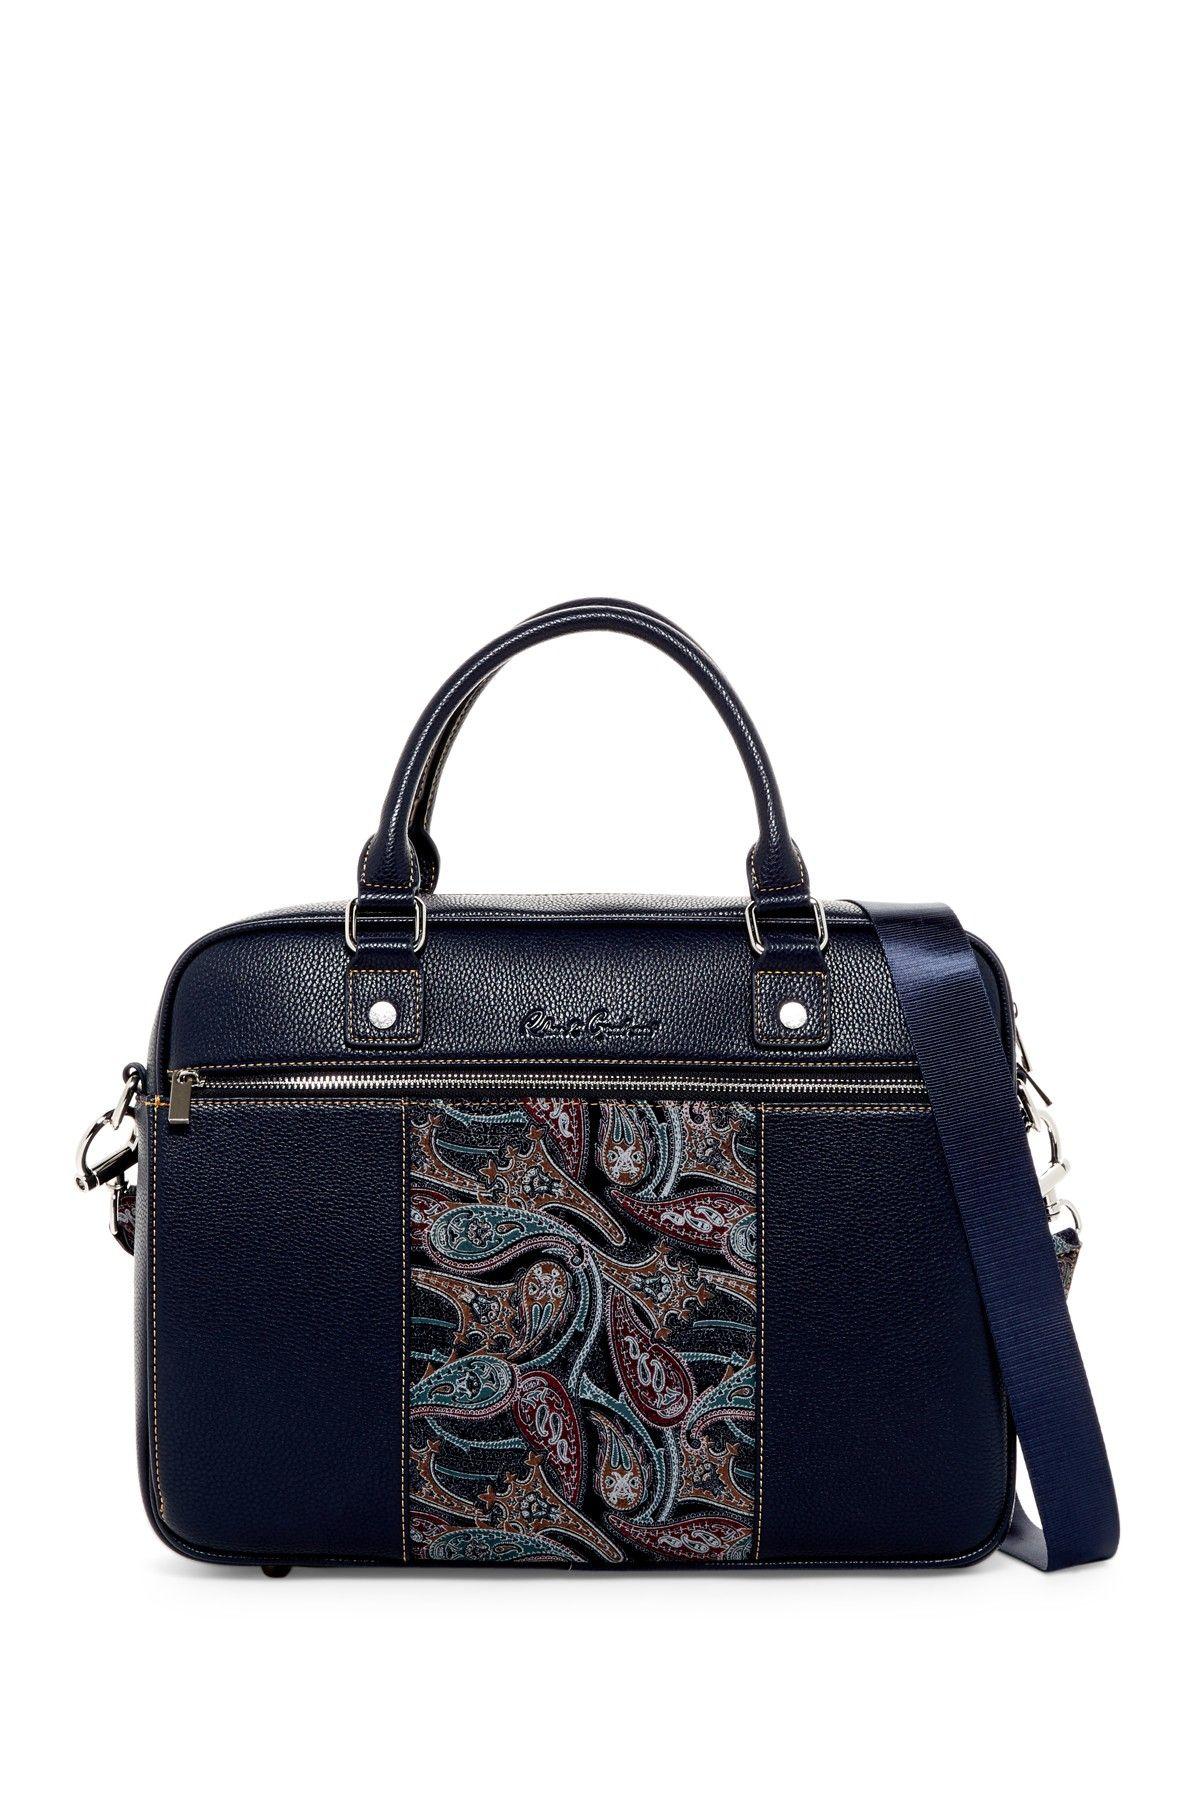 f836cc61f4 Robert Graham | Vatican Leather Trim Messenger Bag | Products | Bags ...